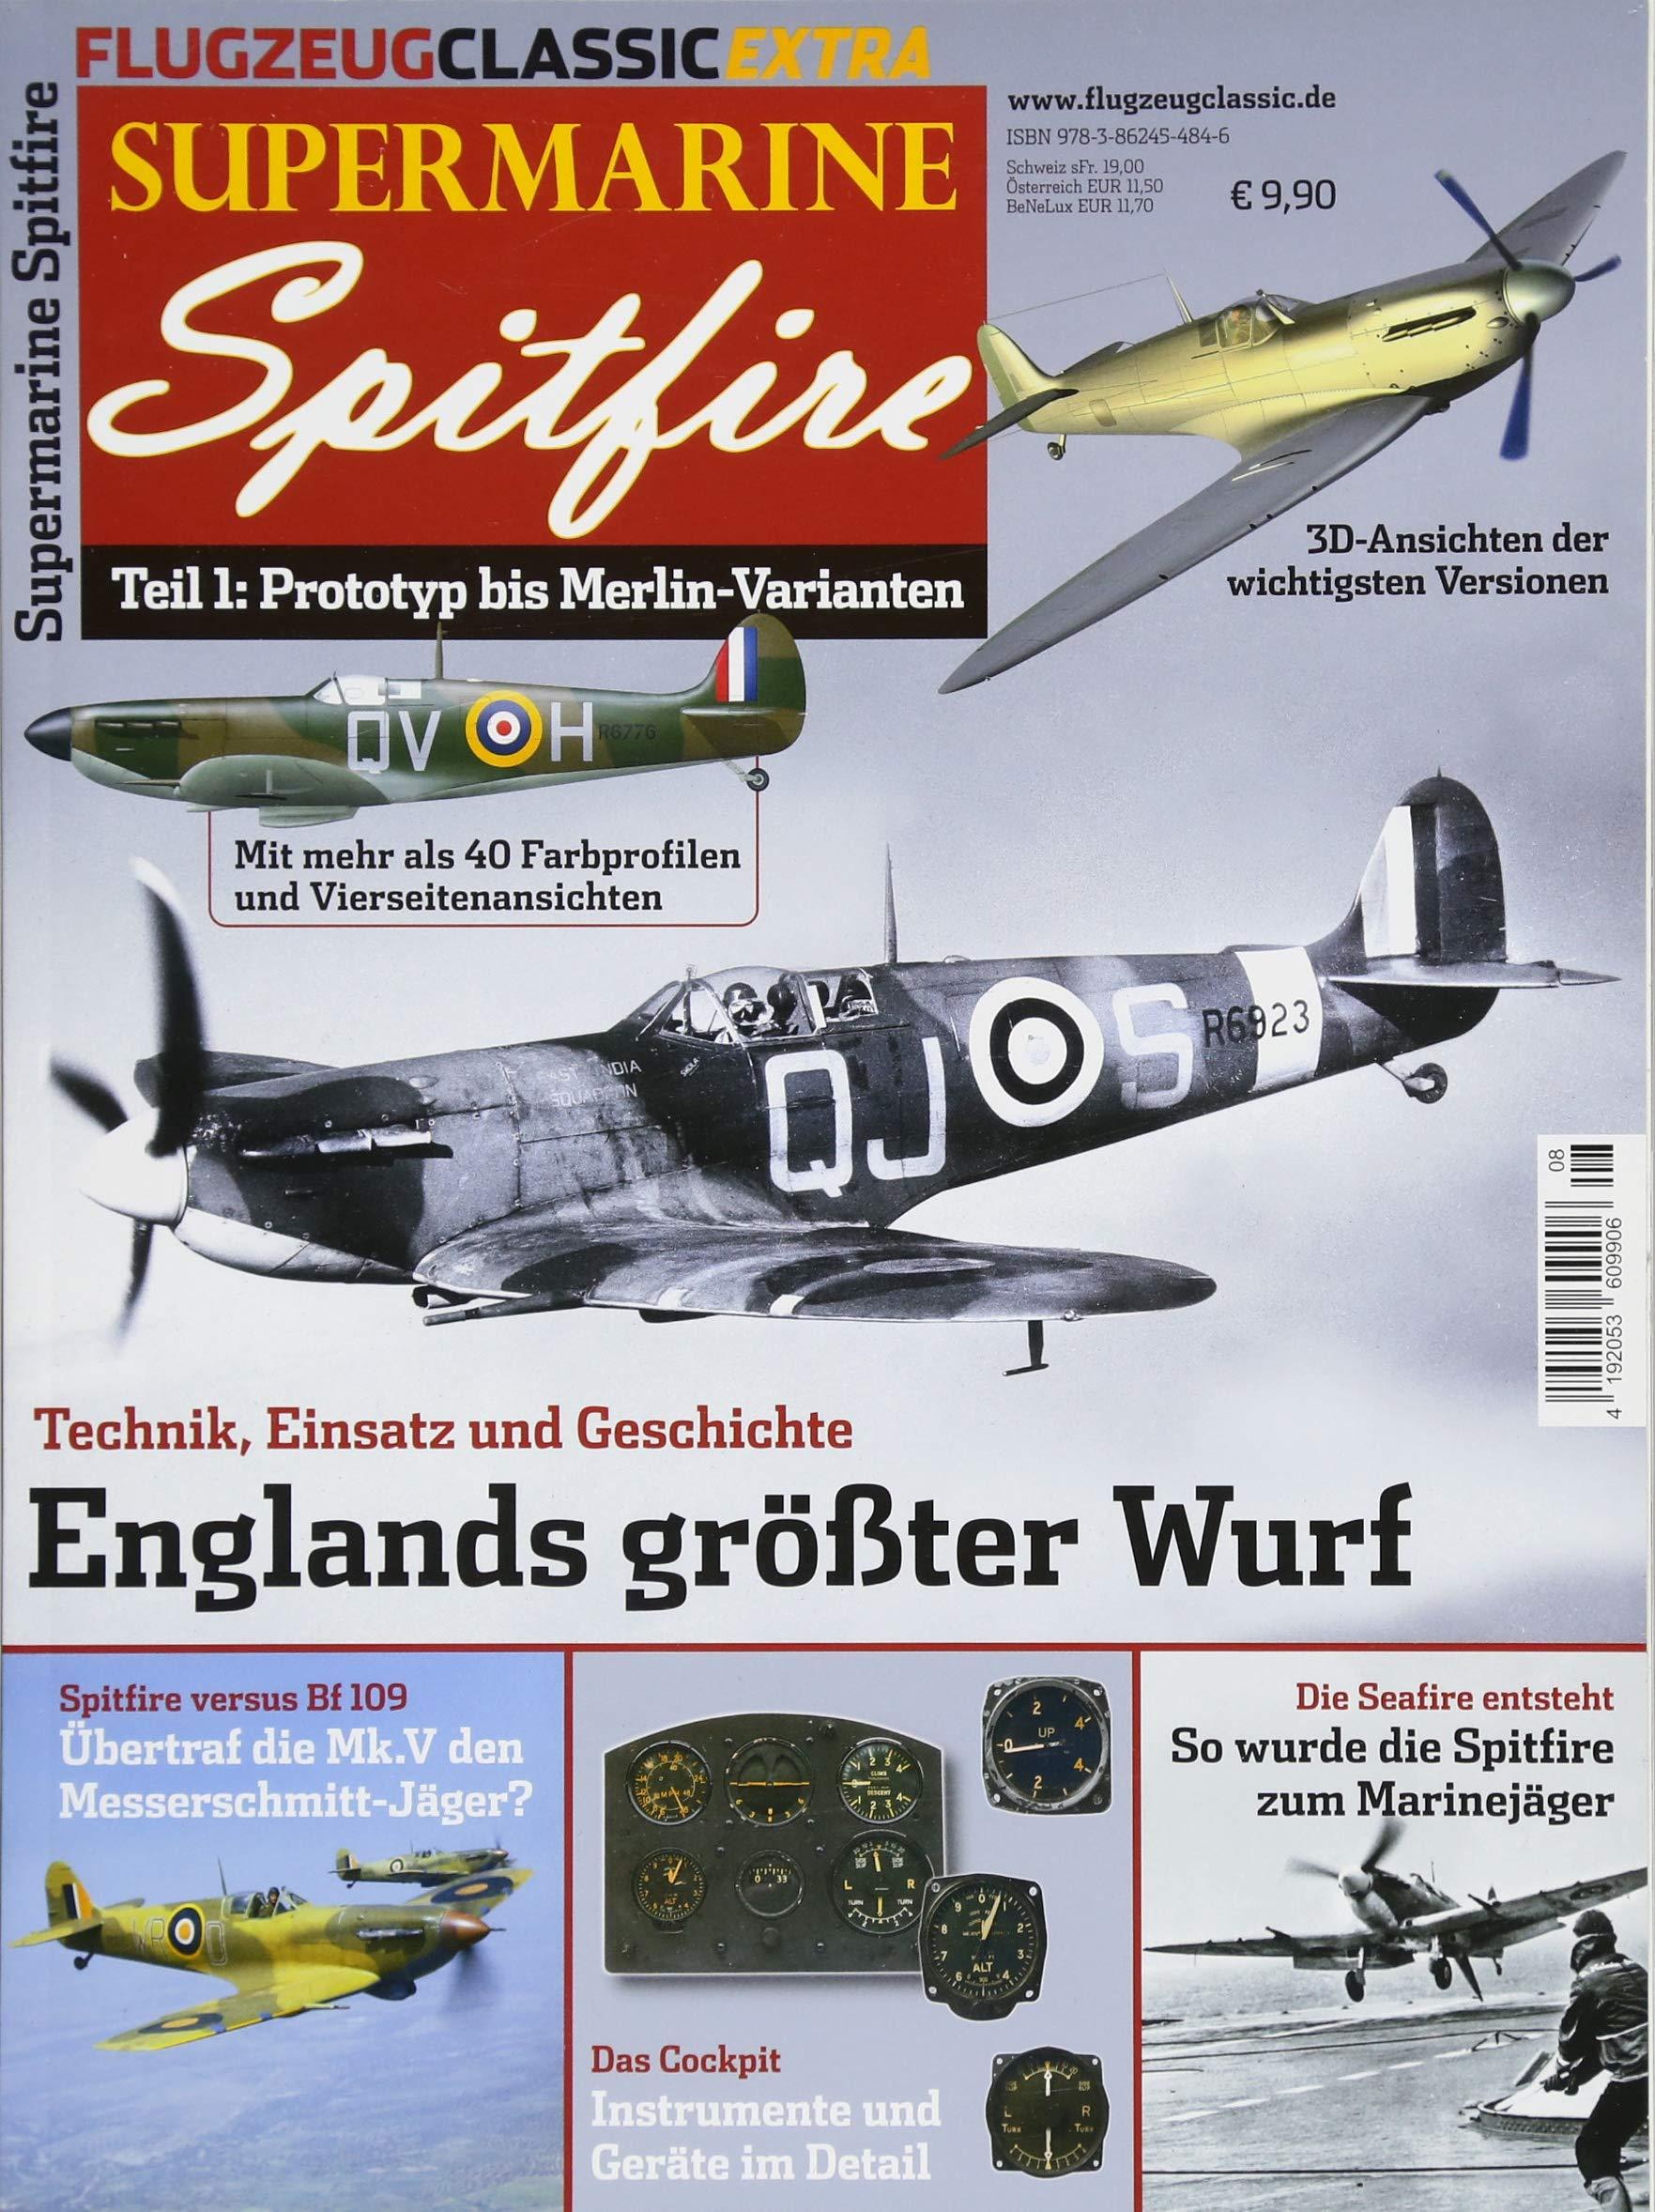 Supermarine Spitfire – Flugzeug Classic Extra 8